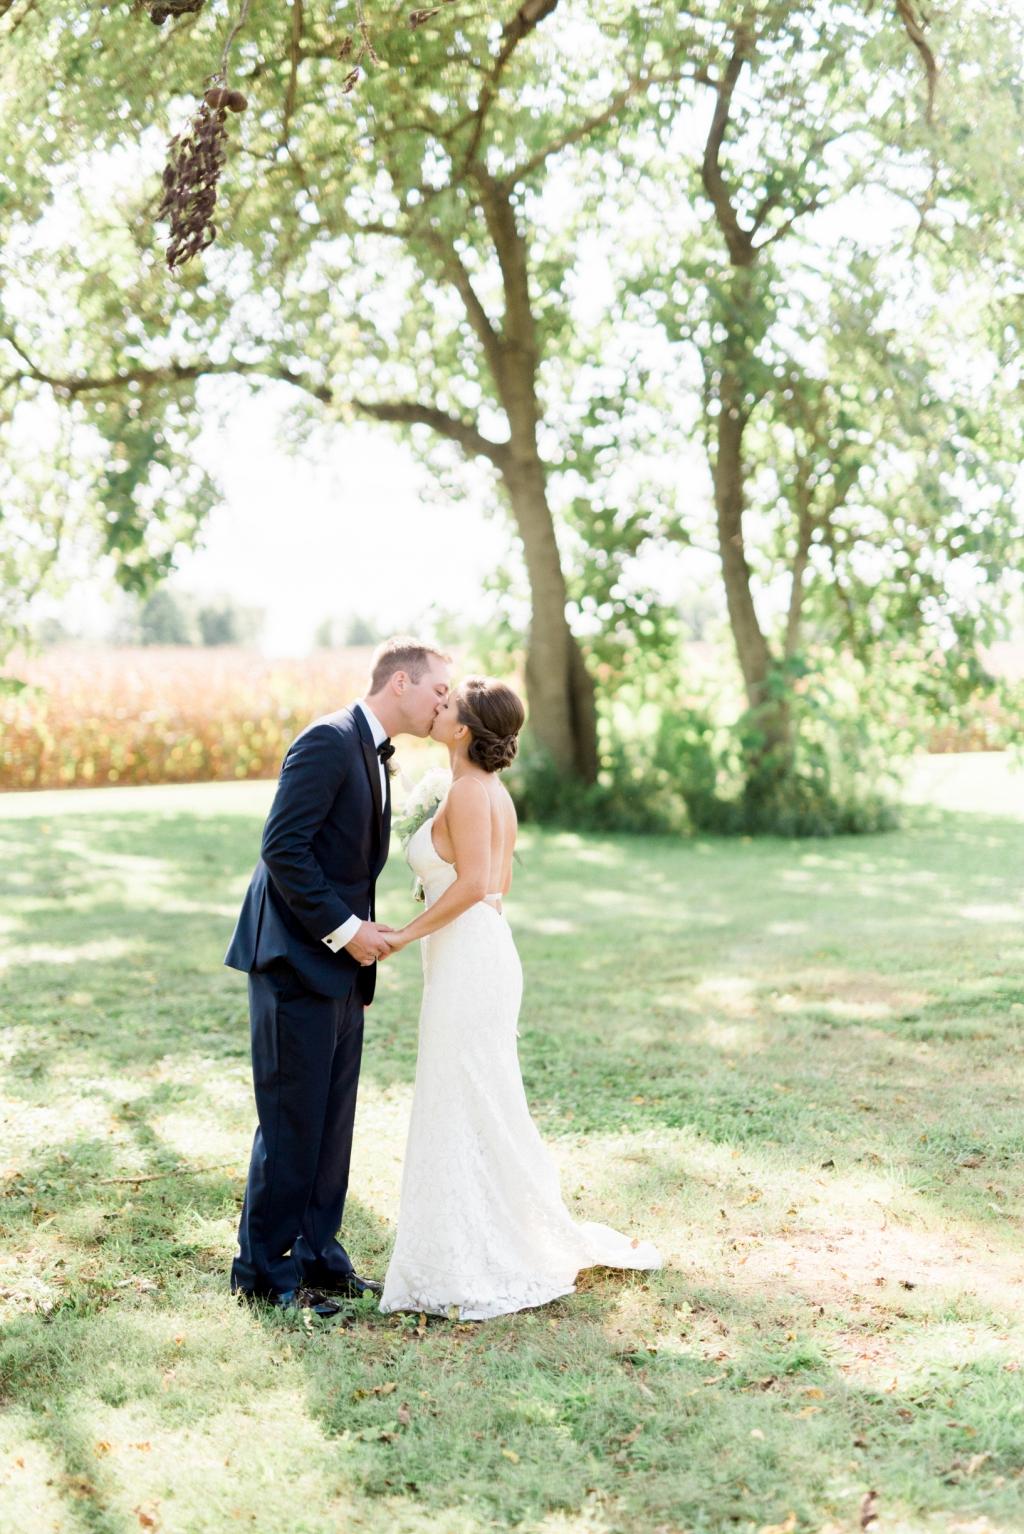 haley-richter-photography-buena-vista-confrence-center-wedding-summer-070